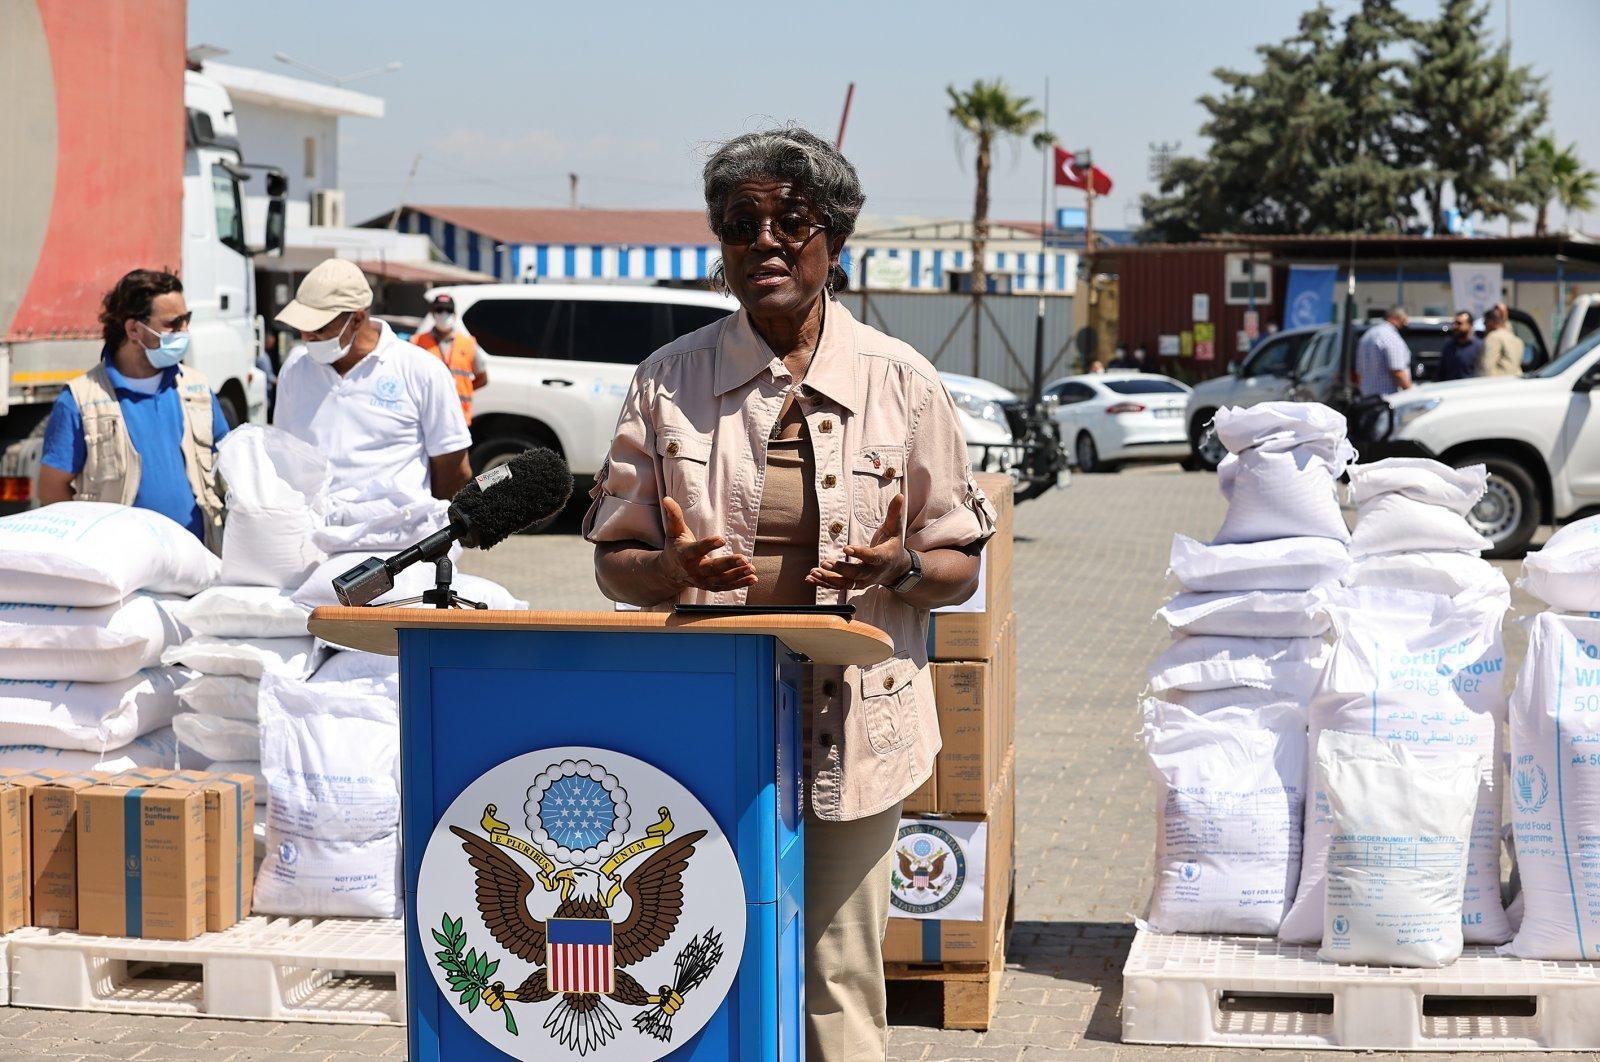 U.S. Ambassador to the U.N., Linda Thomas-Greenfield, visited the World Food Programme's distribution center in southern Hatay's Reyhanlı district, Turkey, June 3, 2021 (AA Photo)